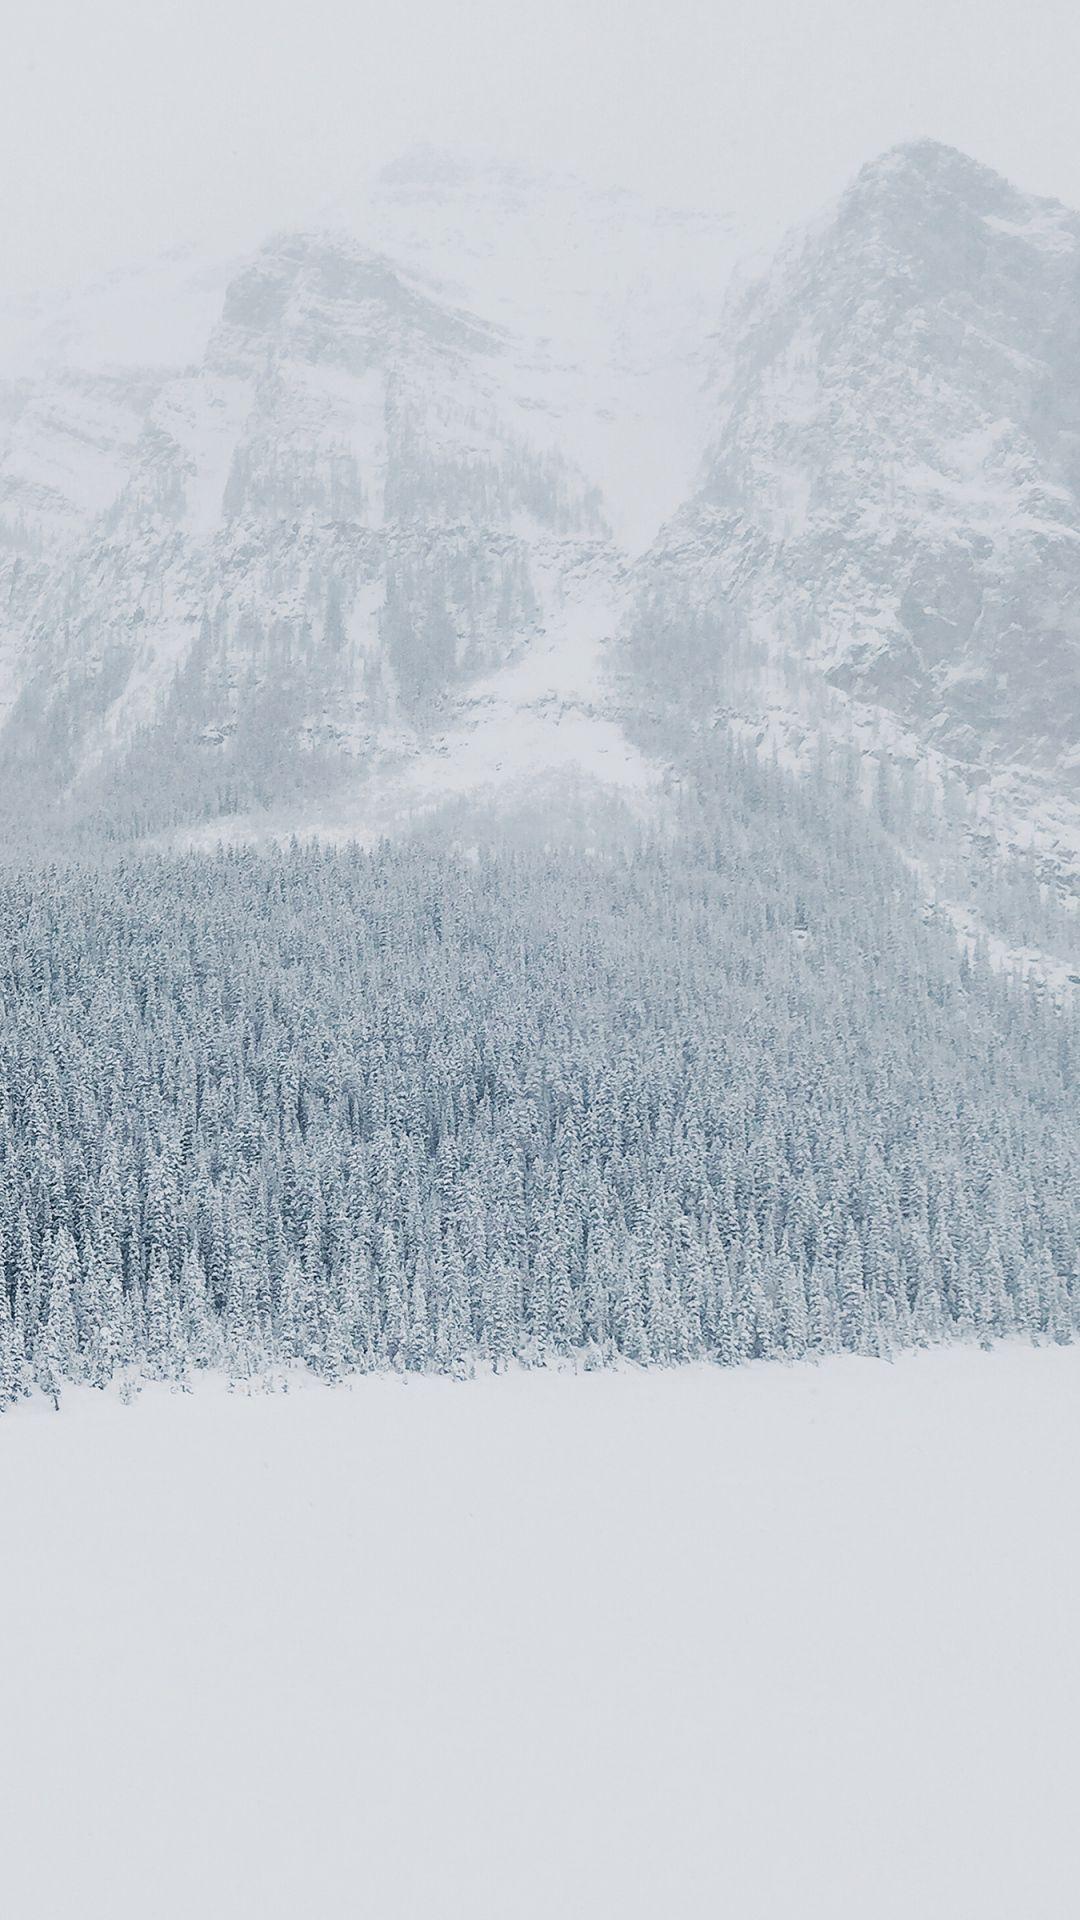 Download Wallpaper 1080x1920 Winter Snow Mountains Trees Sony Xperia Z1 Zl Z Samsung Galaxy S4 Htc One Hd Bac Infinity Wallpaper Mountain Wallpaper Snow